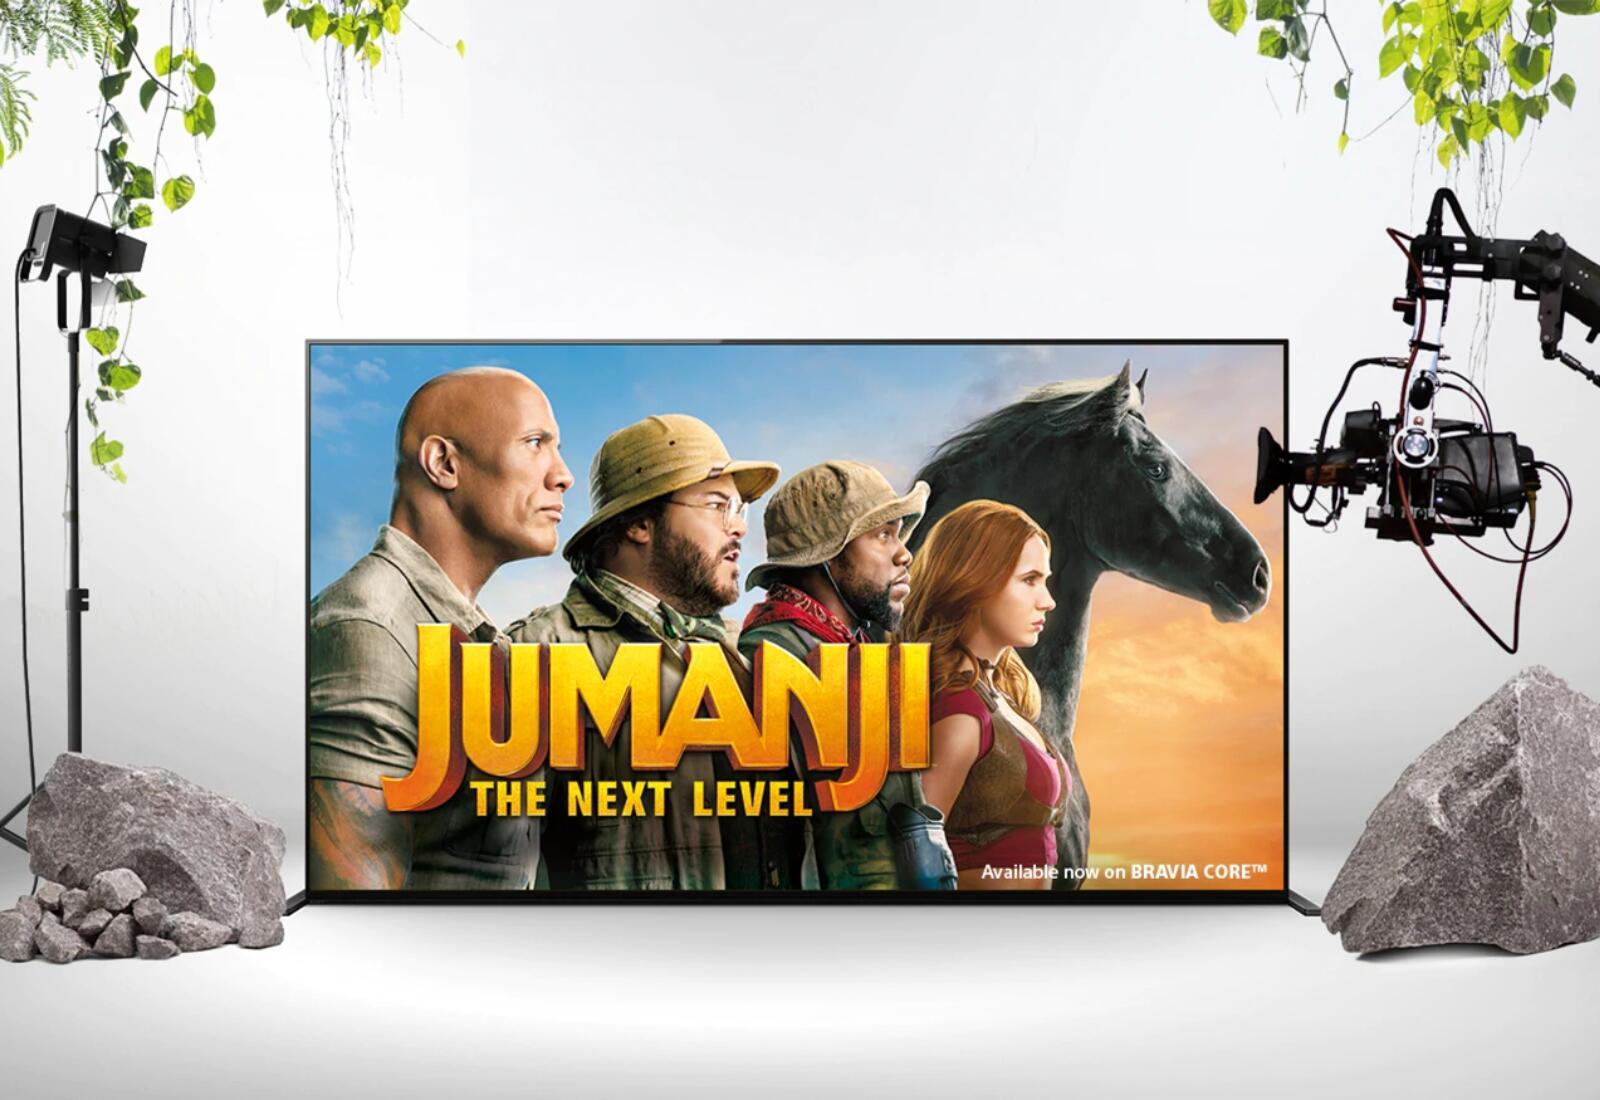 Sony Bravia Core Jumani